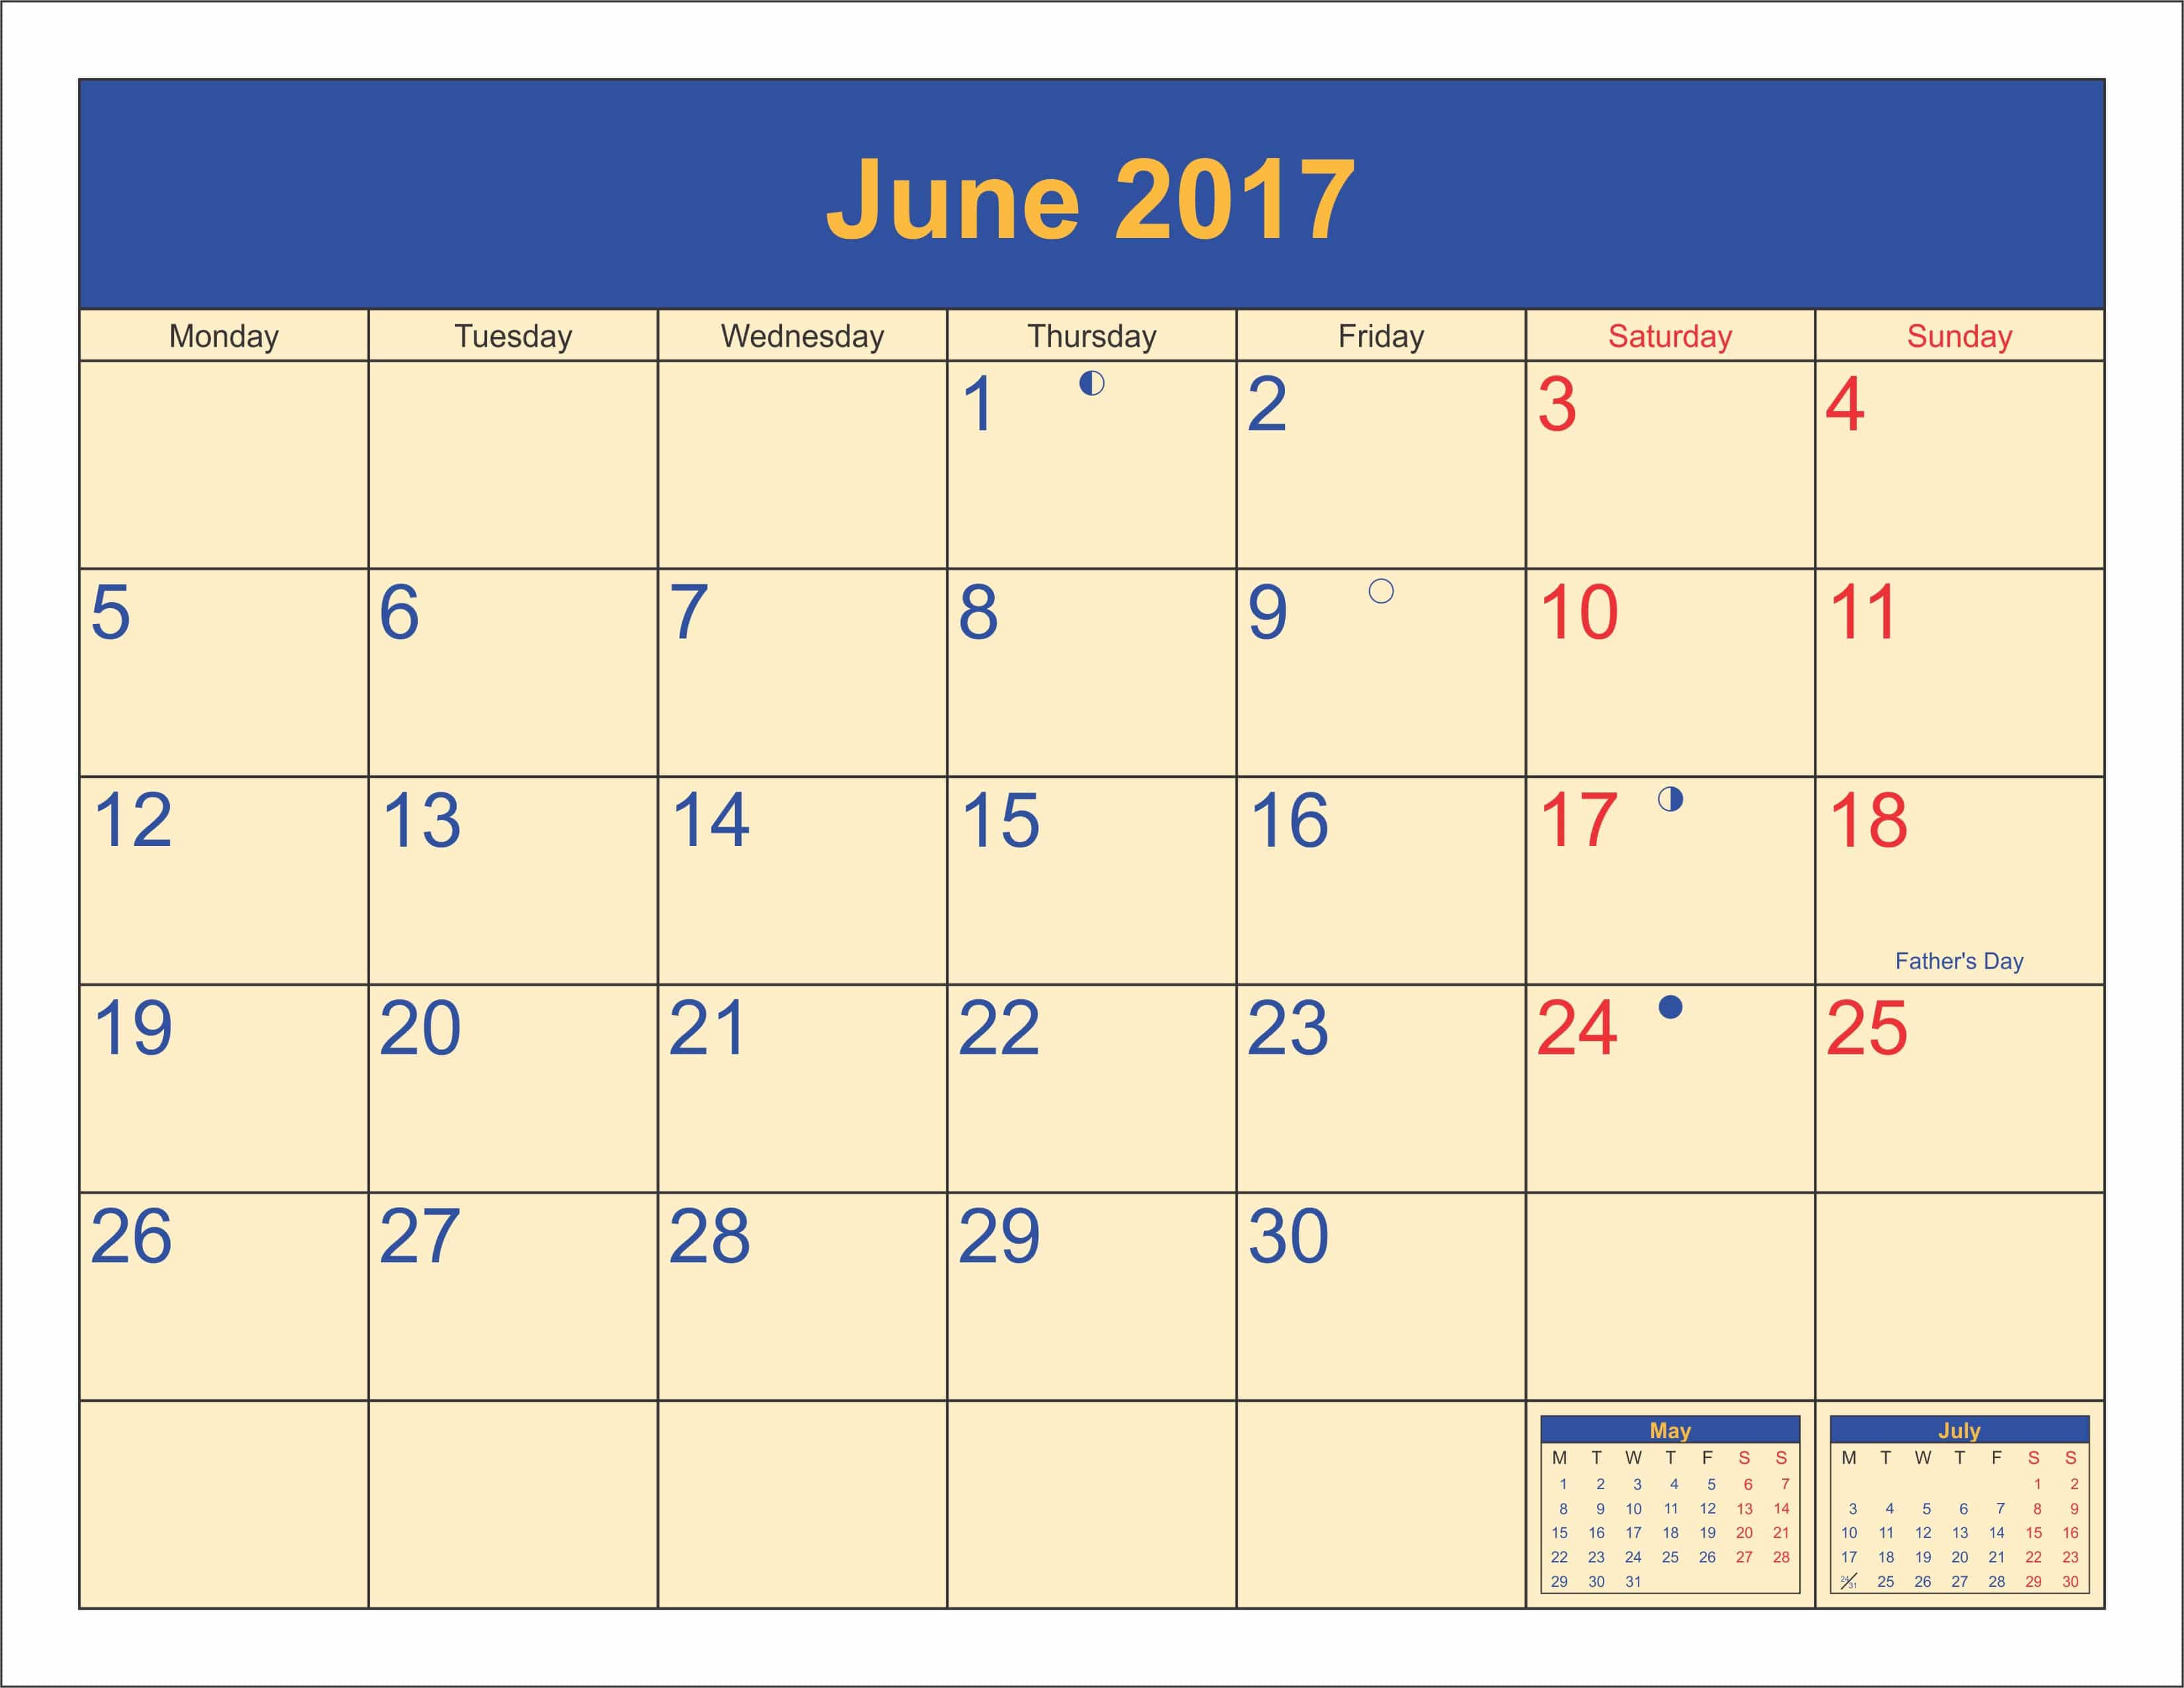 June 2017 Printable Calendar With Holidays UK